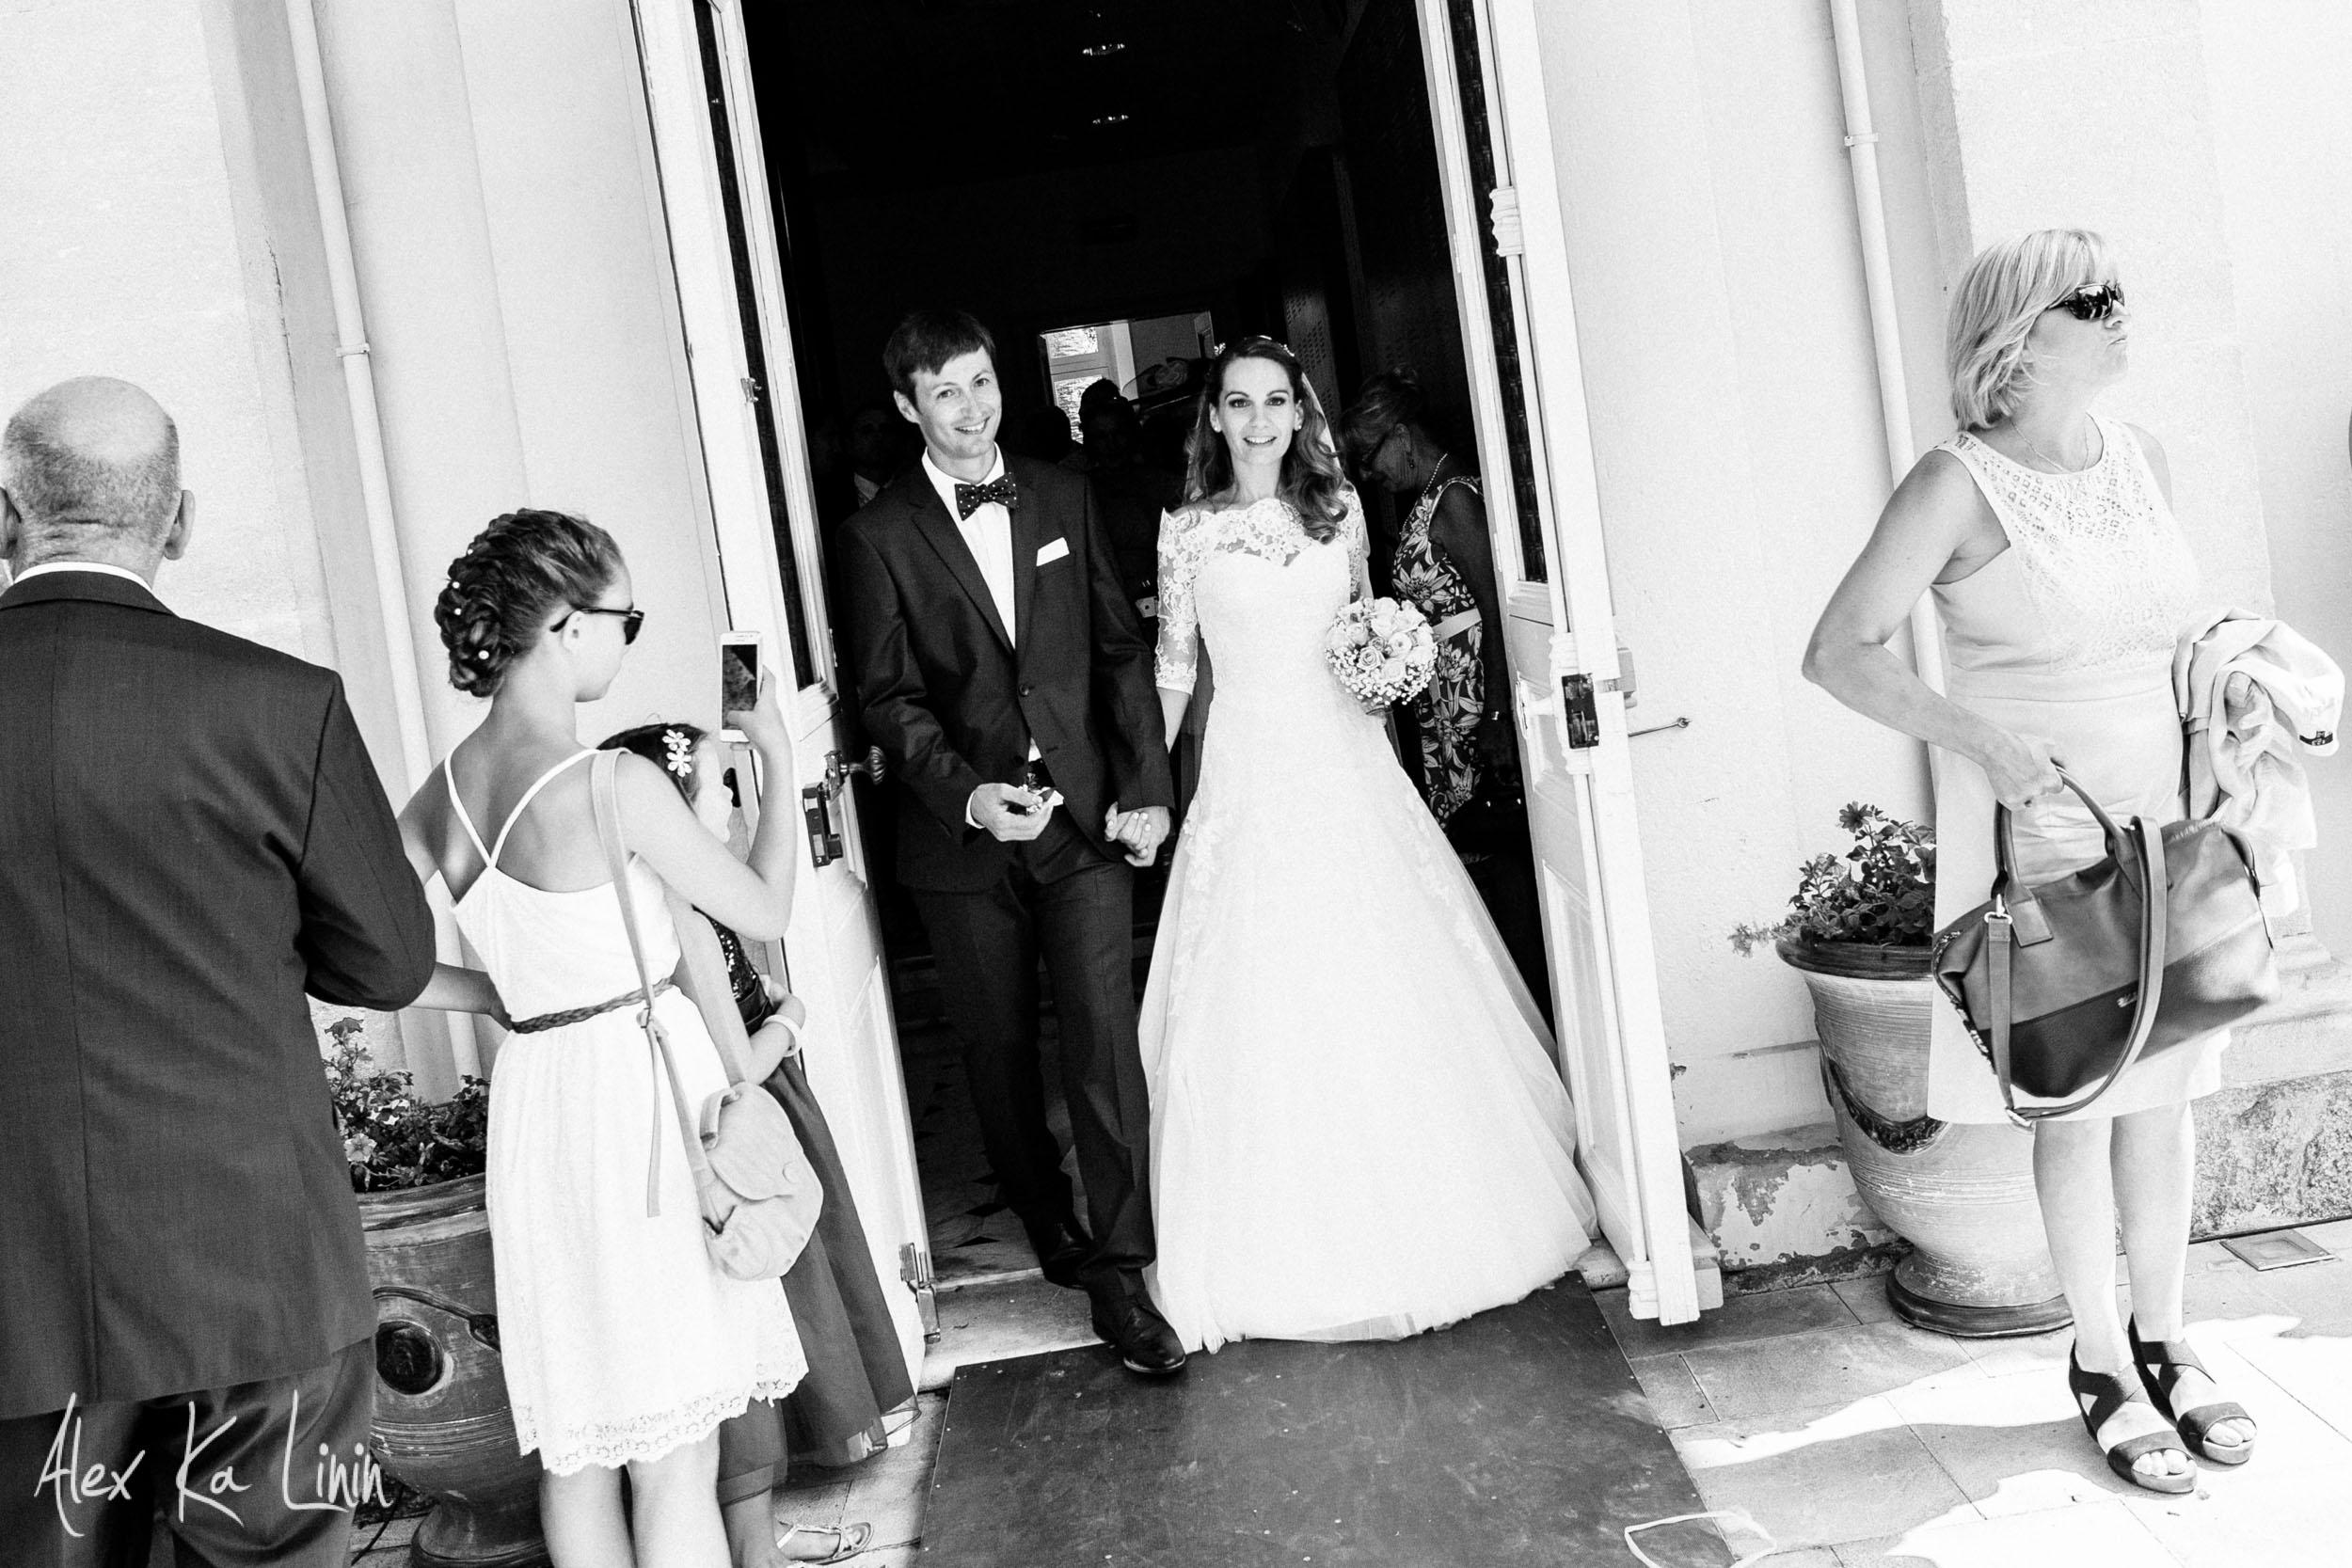 AlexKa_wedding_mariage_photographer-16.jpg